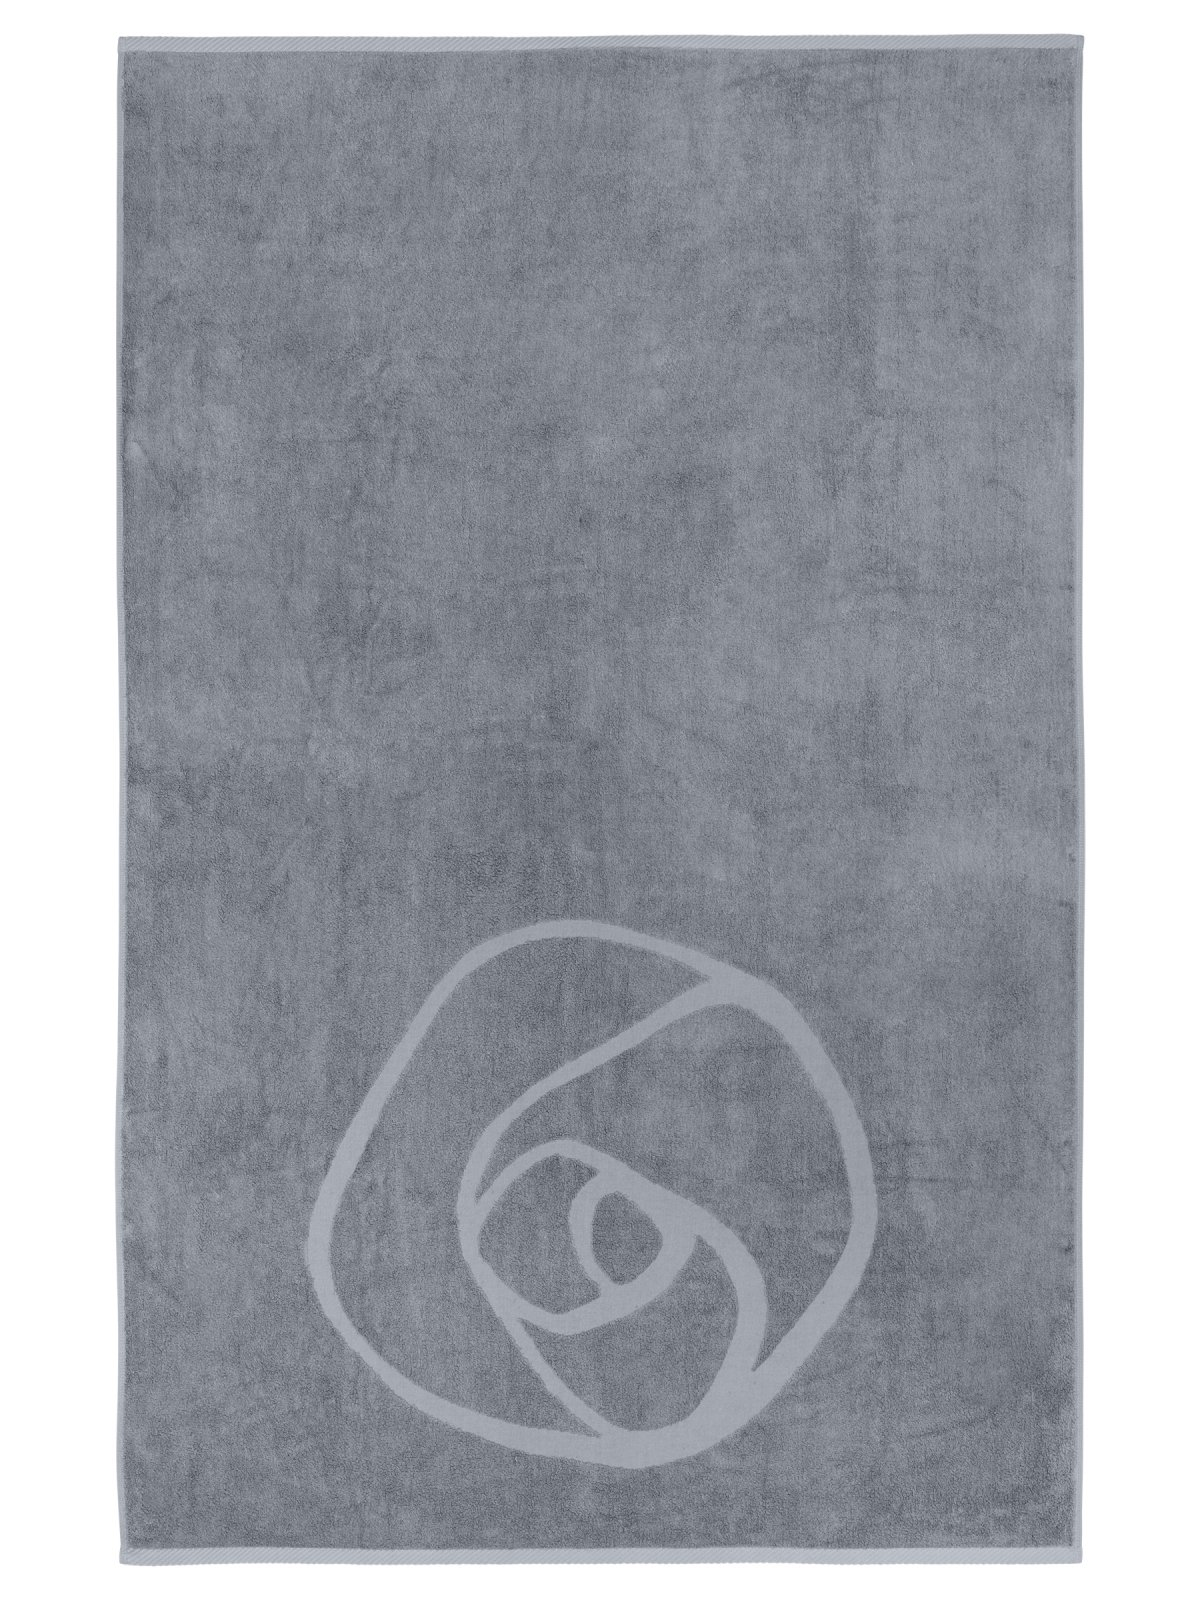 Towel 160 X 100 Cm Charcoal Grey Home Collection Rosemunde Copenhagen